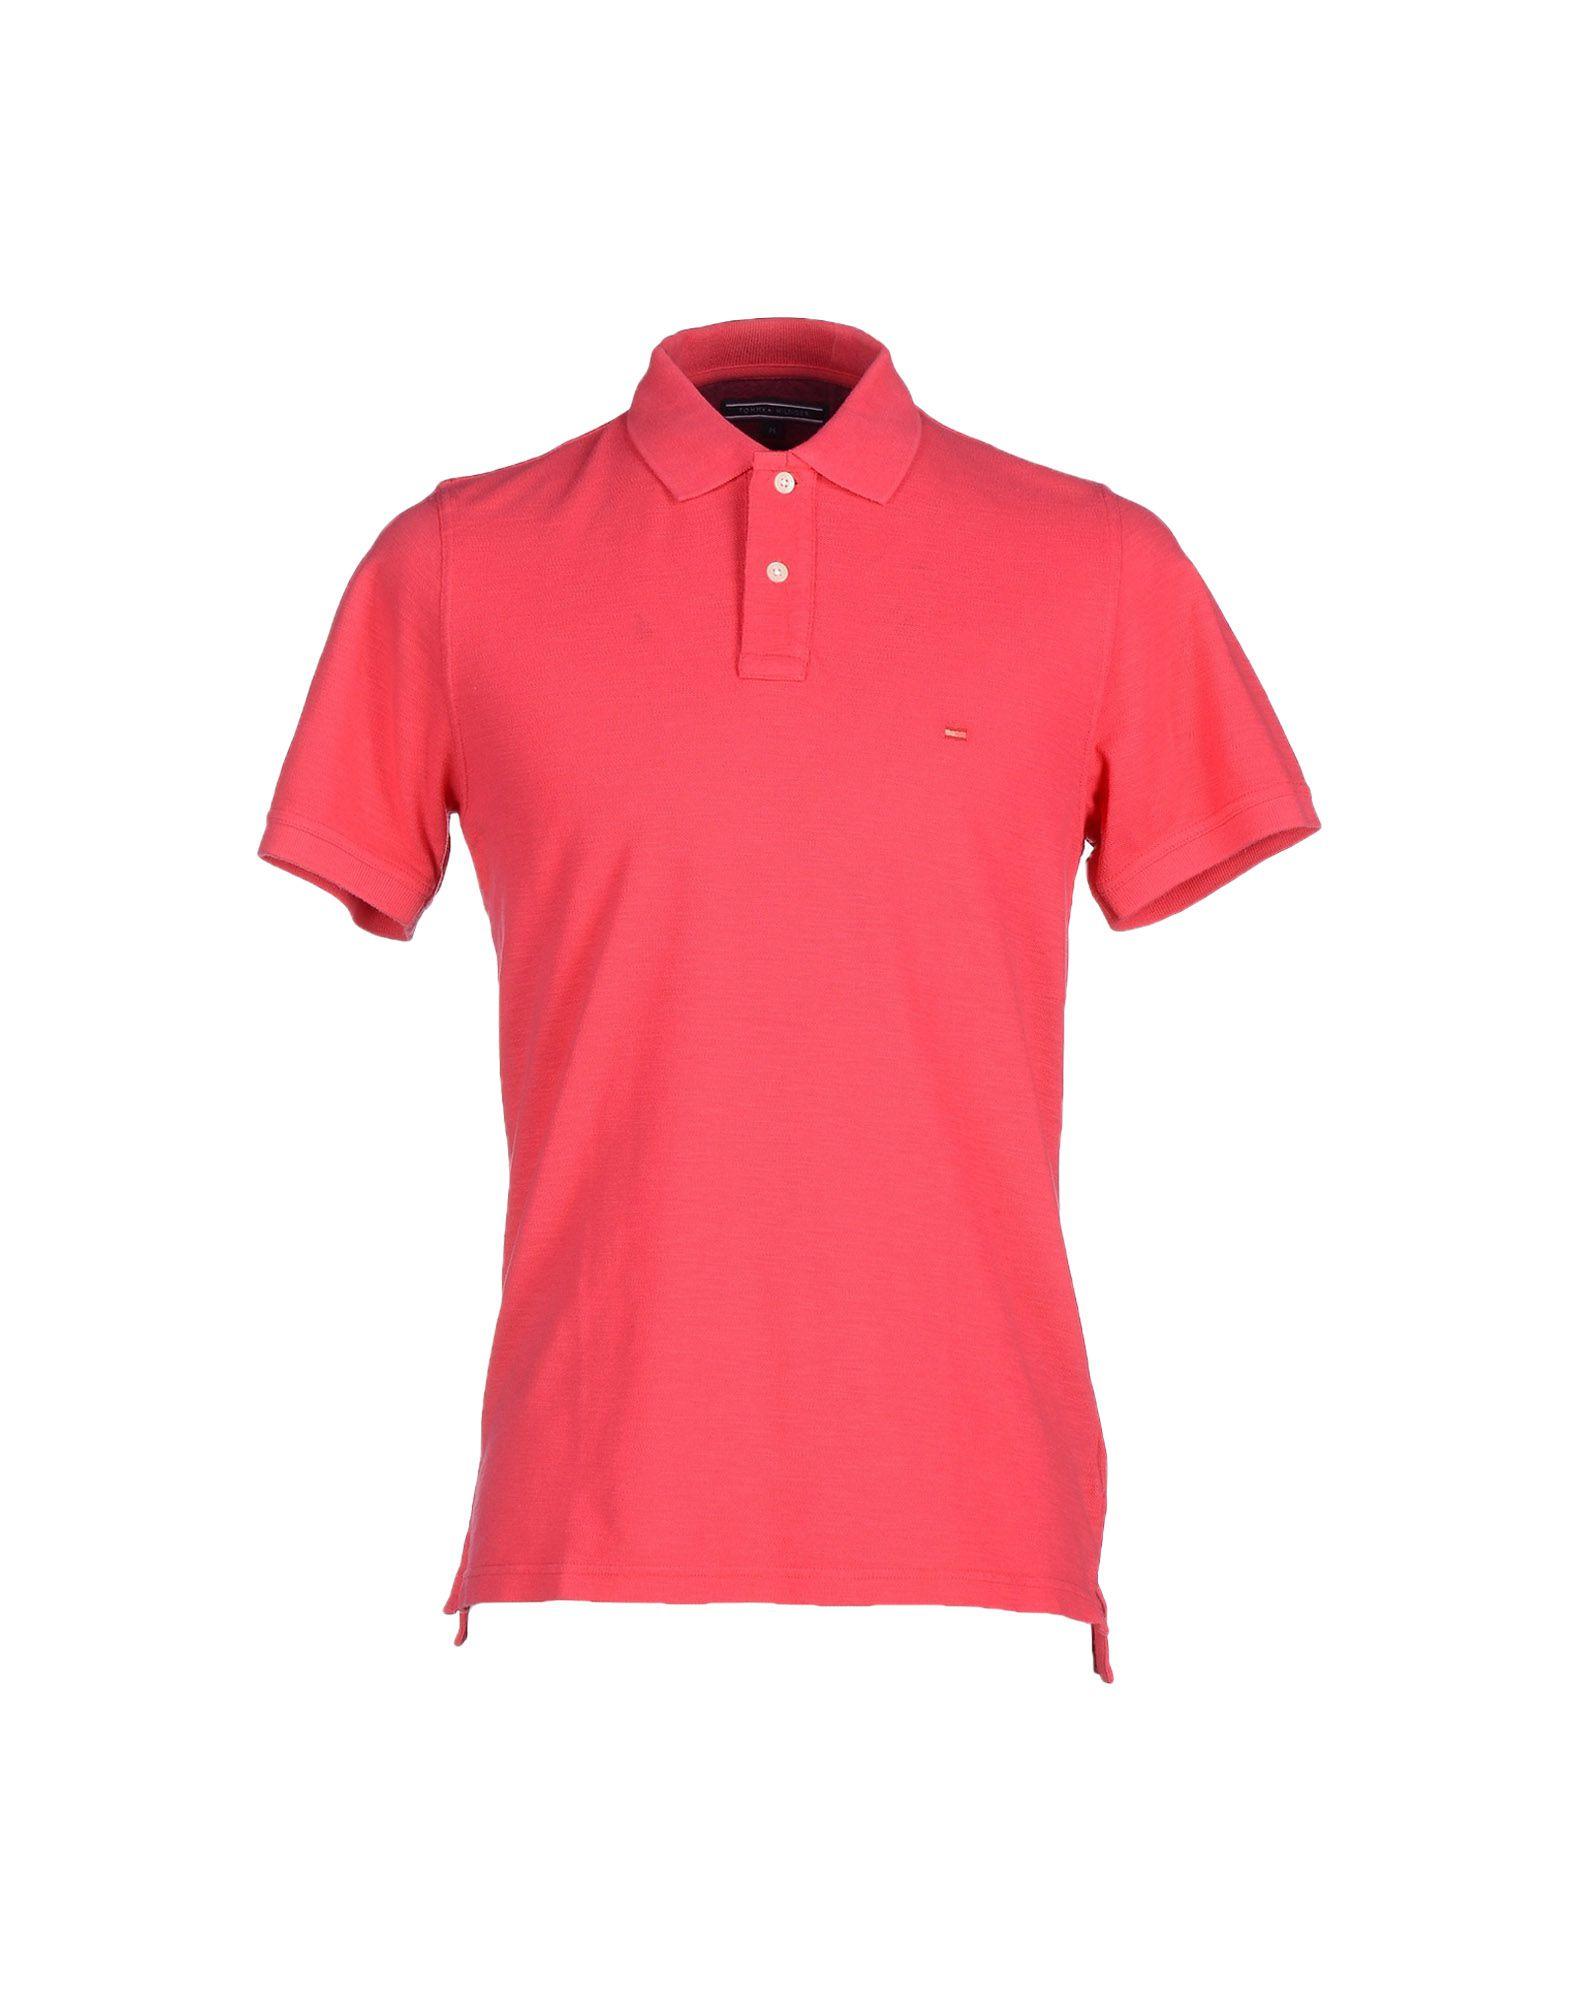 tommy hilfiger polo shirt in pink for men coral lyst. Black Bedroom Furniture Sets. Home Design Ideas